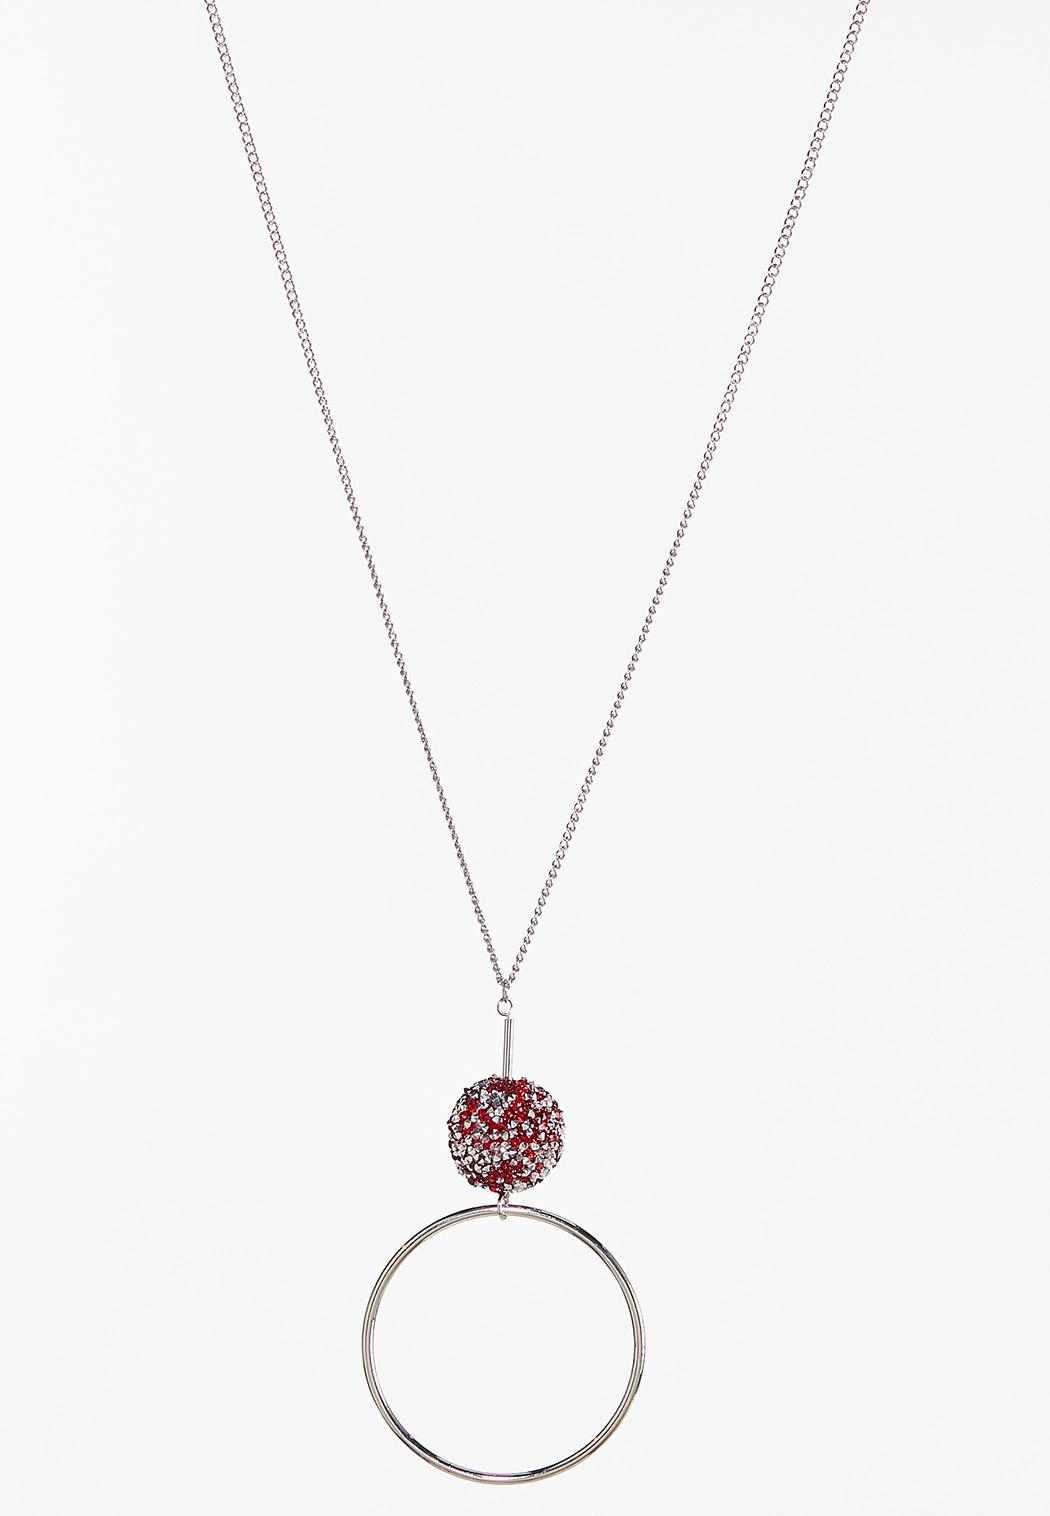 Red Druzy Pendant Necklace